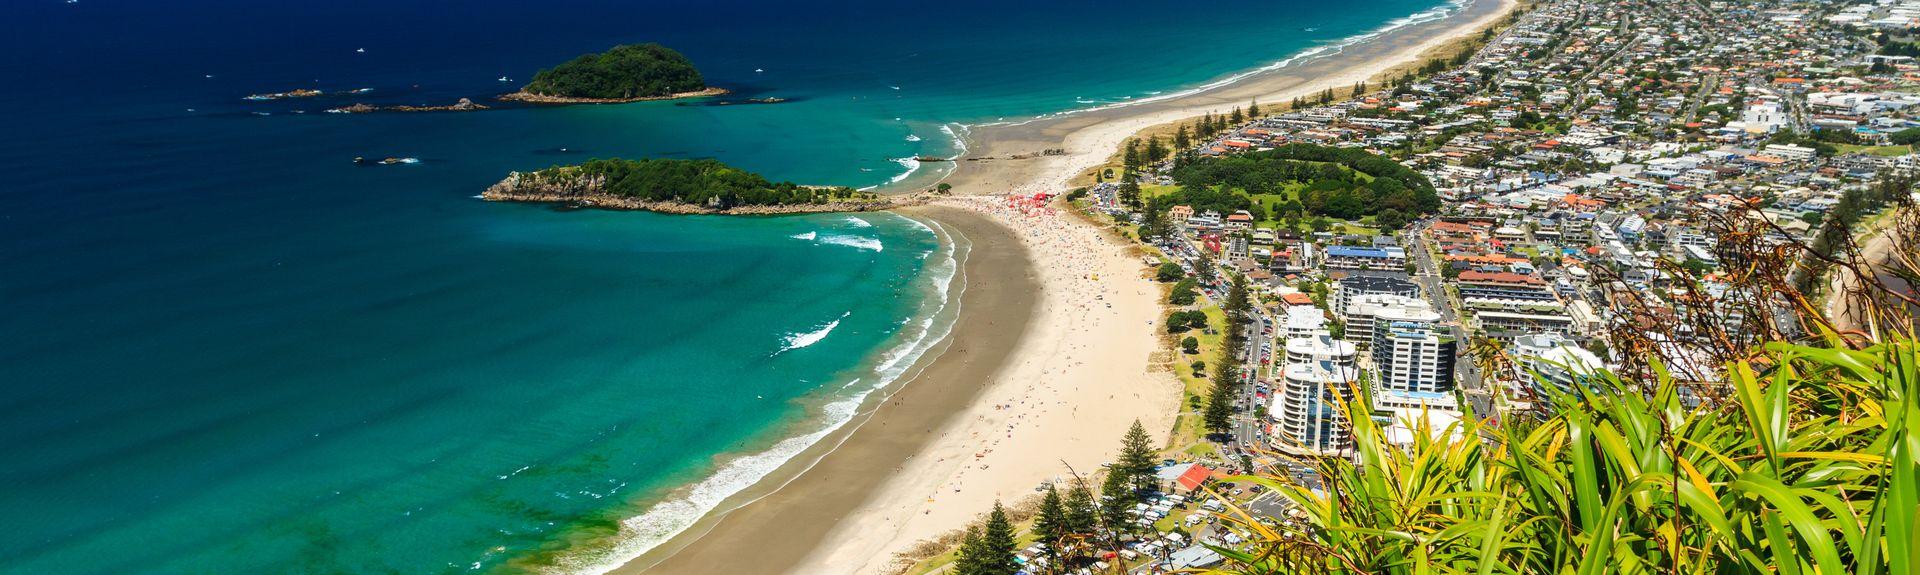 Tauranga, Bay Of Plenty, North Island, New Zealand